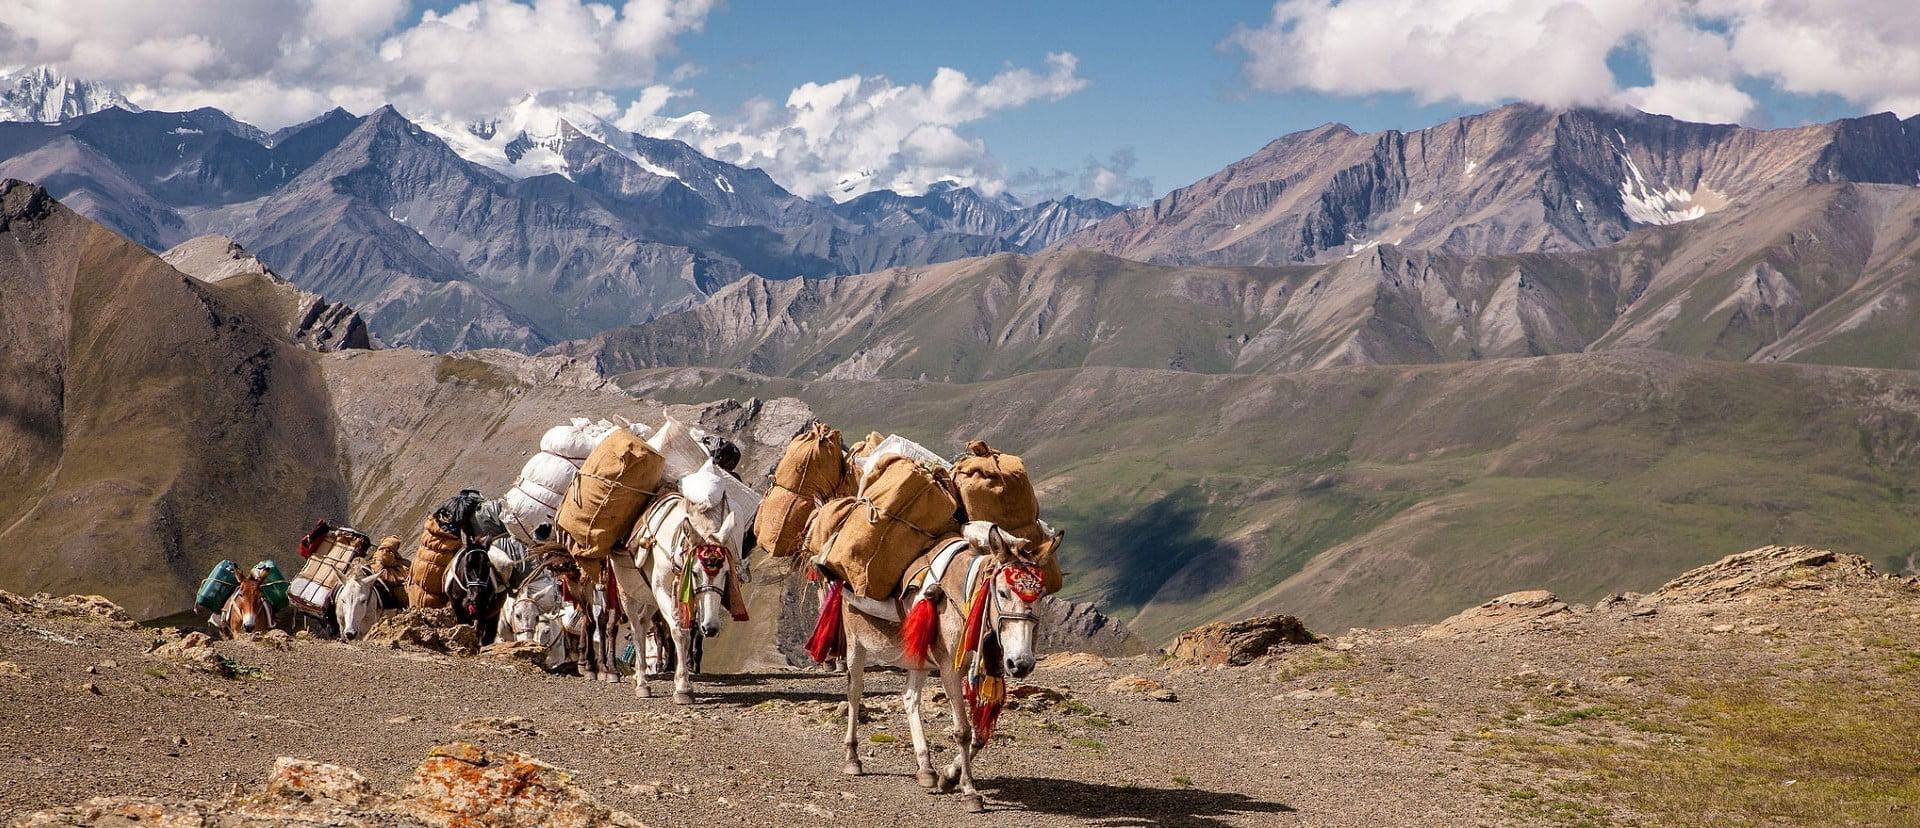 Everest Base Camp Trekking  Annapurna Trekking   Langtang  Trekking - Alpine Club of Himalaya